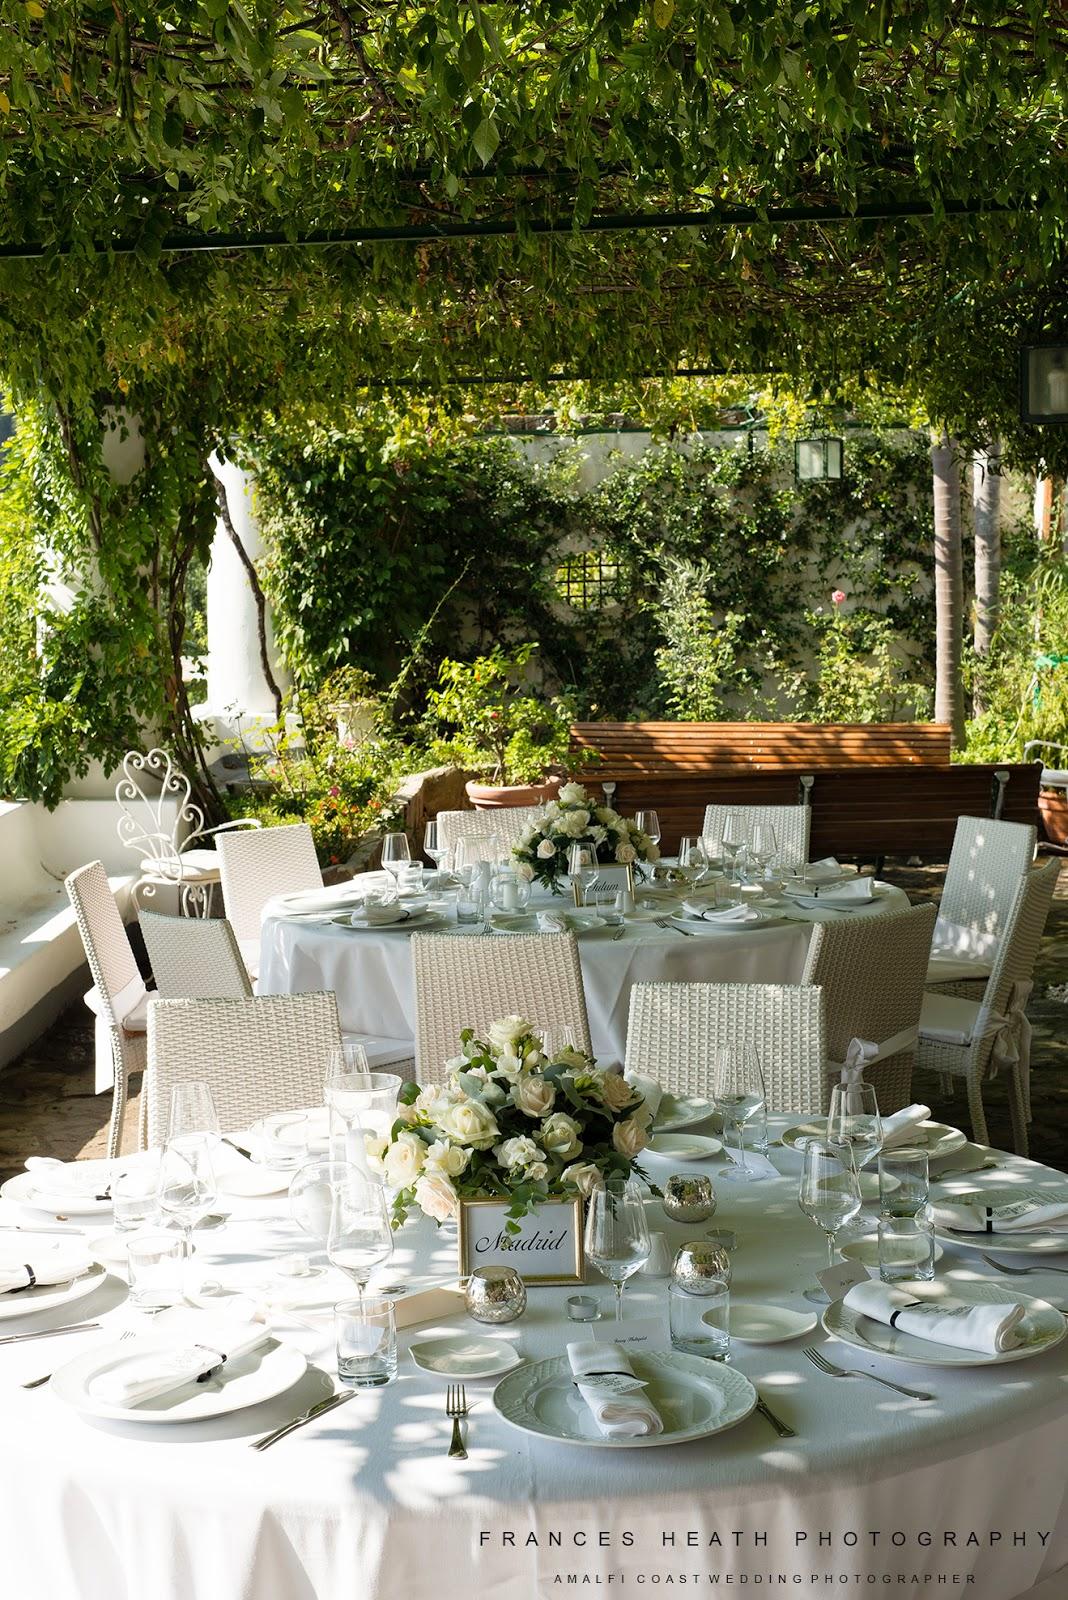 Wedding table decorations at Villa Oliviero in Positano